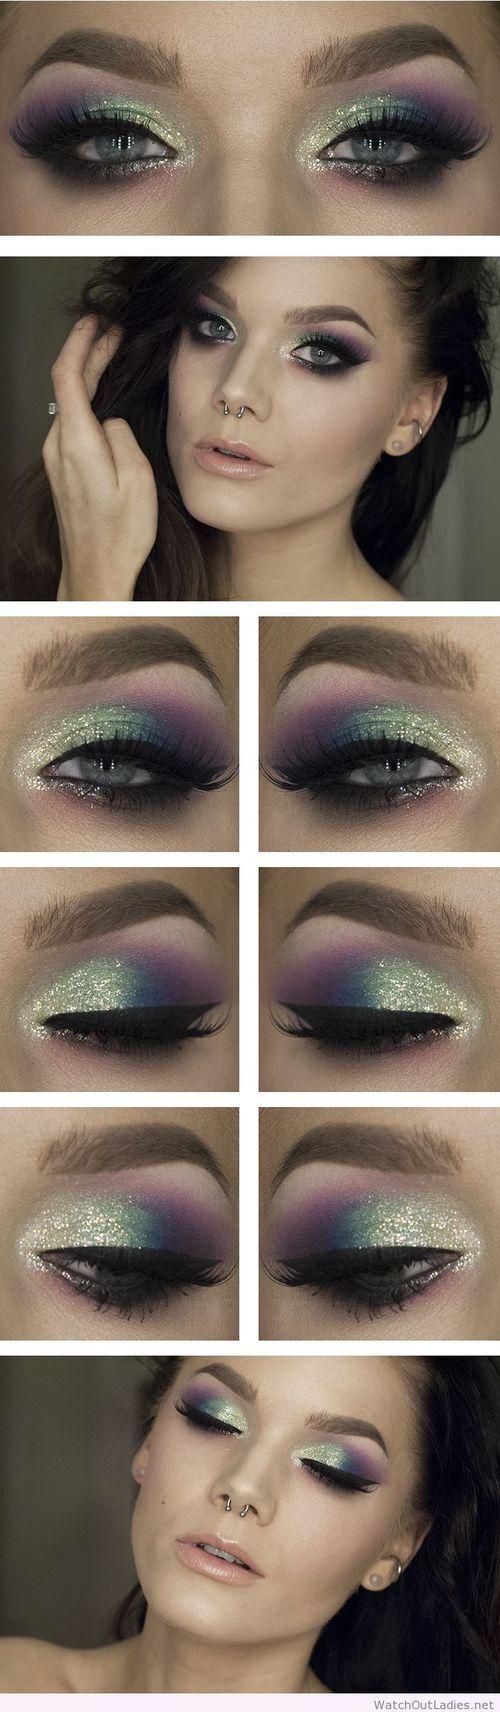 Linda Hallberg eye makeup colors with glitter